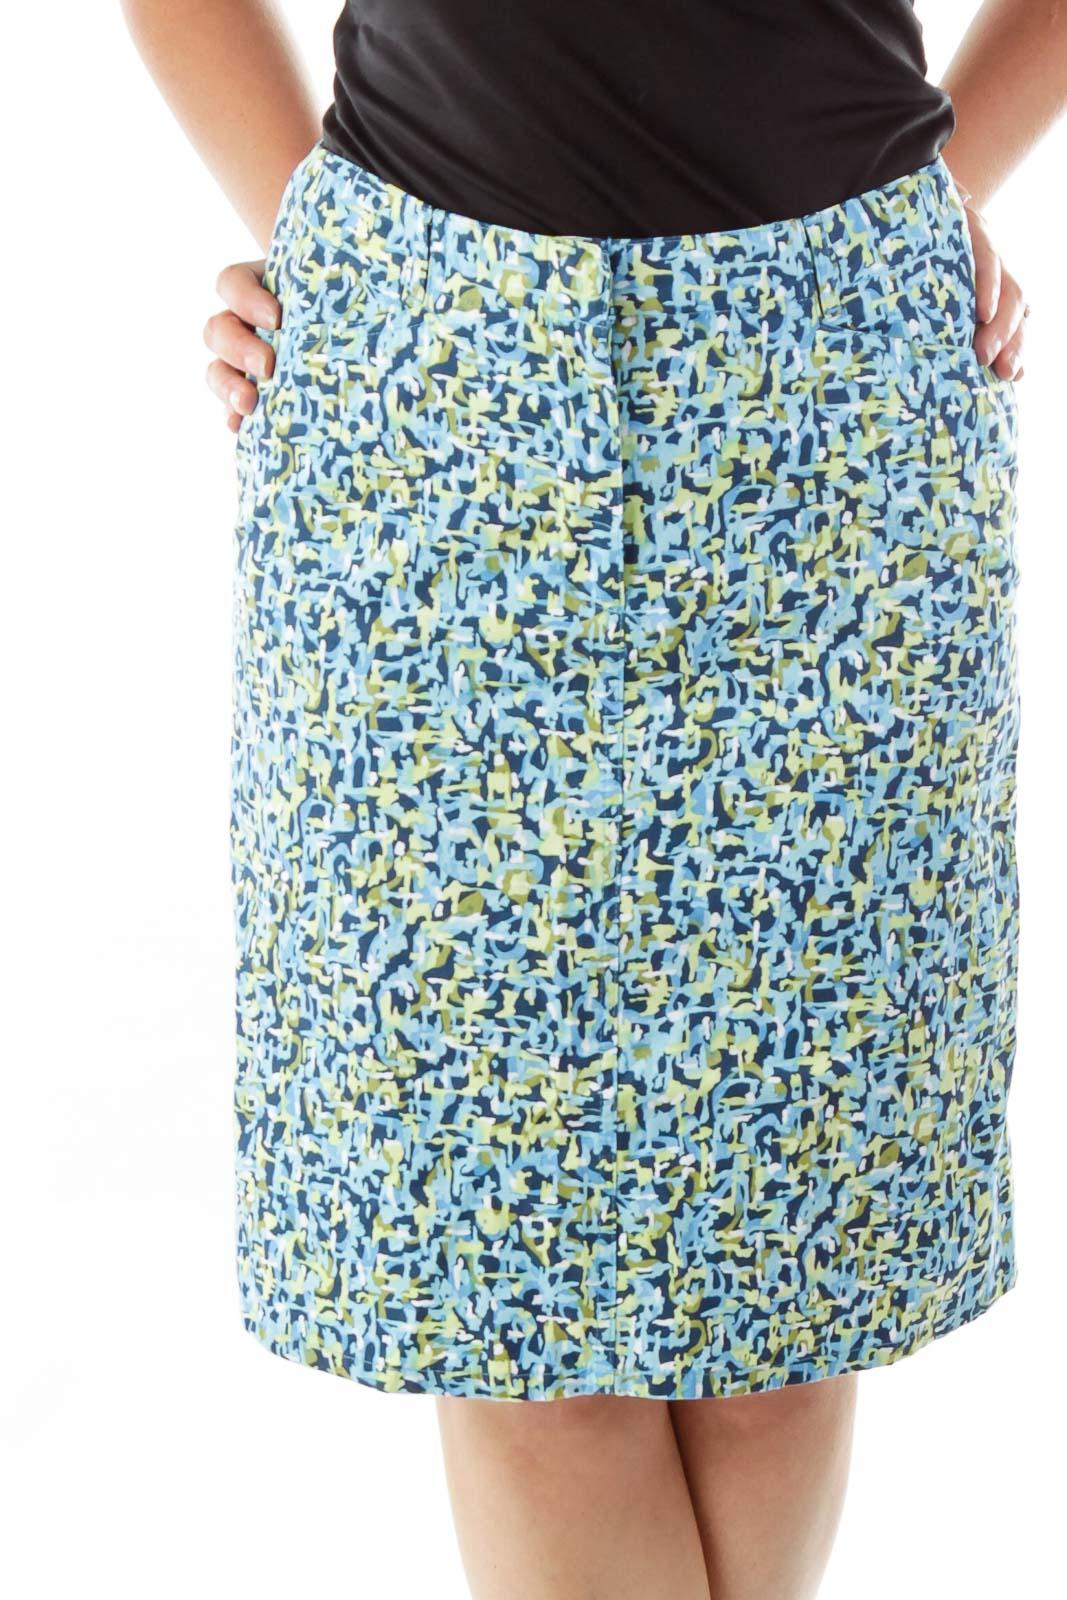 Petite Blue Green Printed A-line Skirt